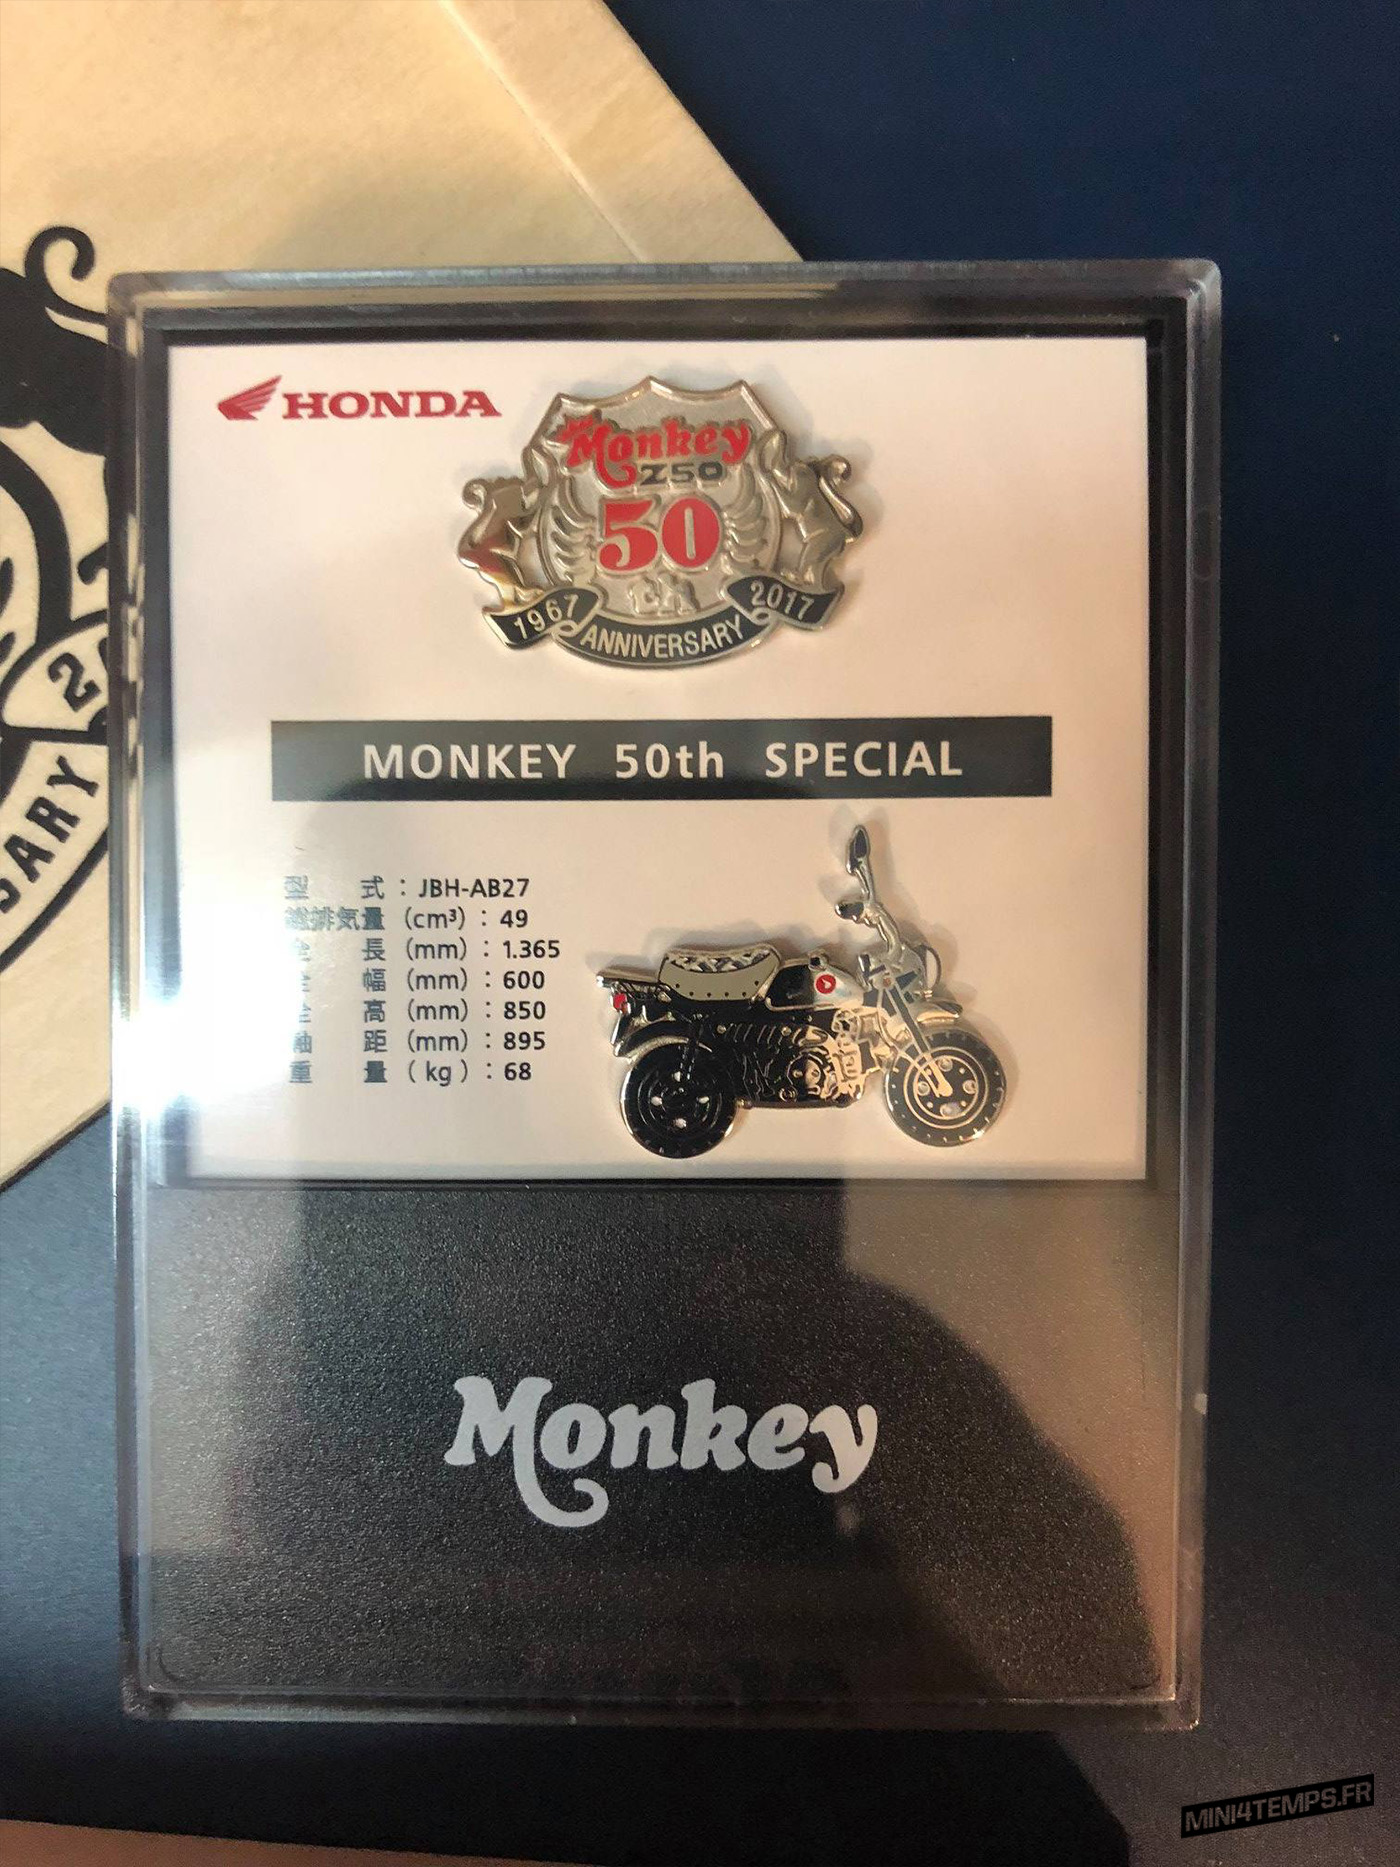 Des goodies Honda Monkey 50th Anniversary - mini4temps.fr